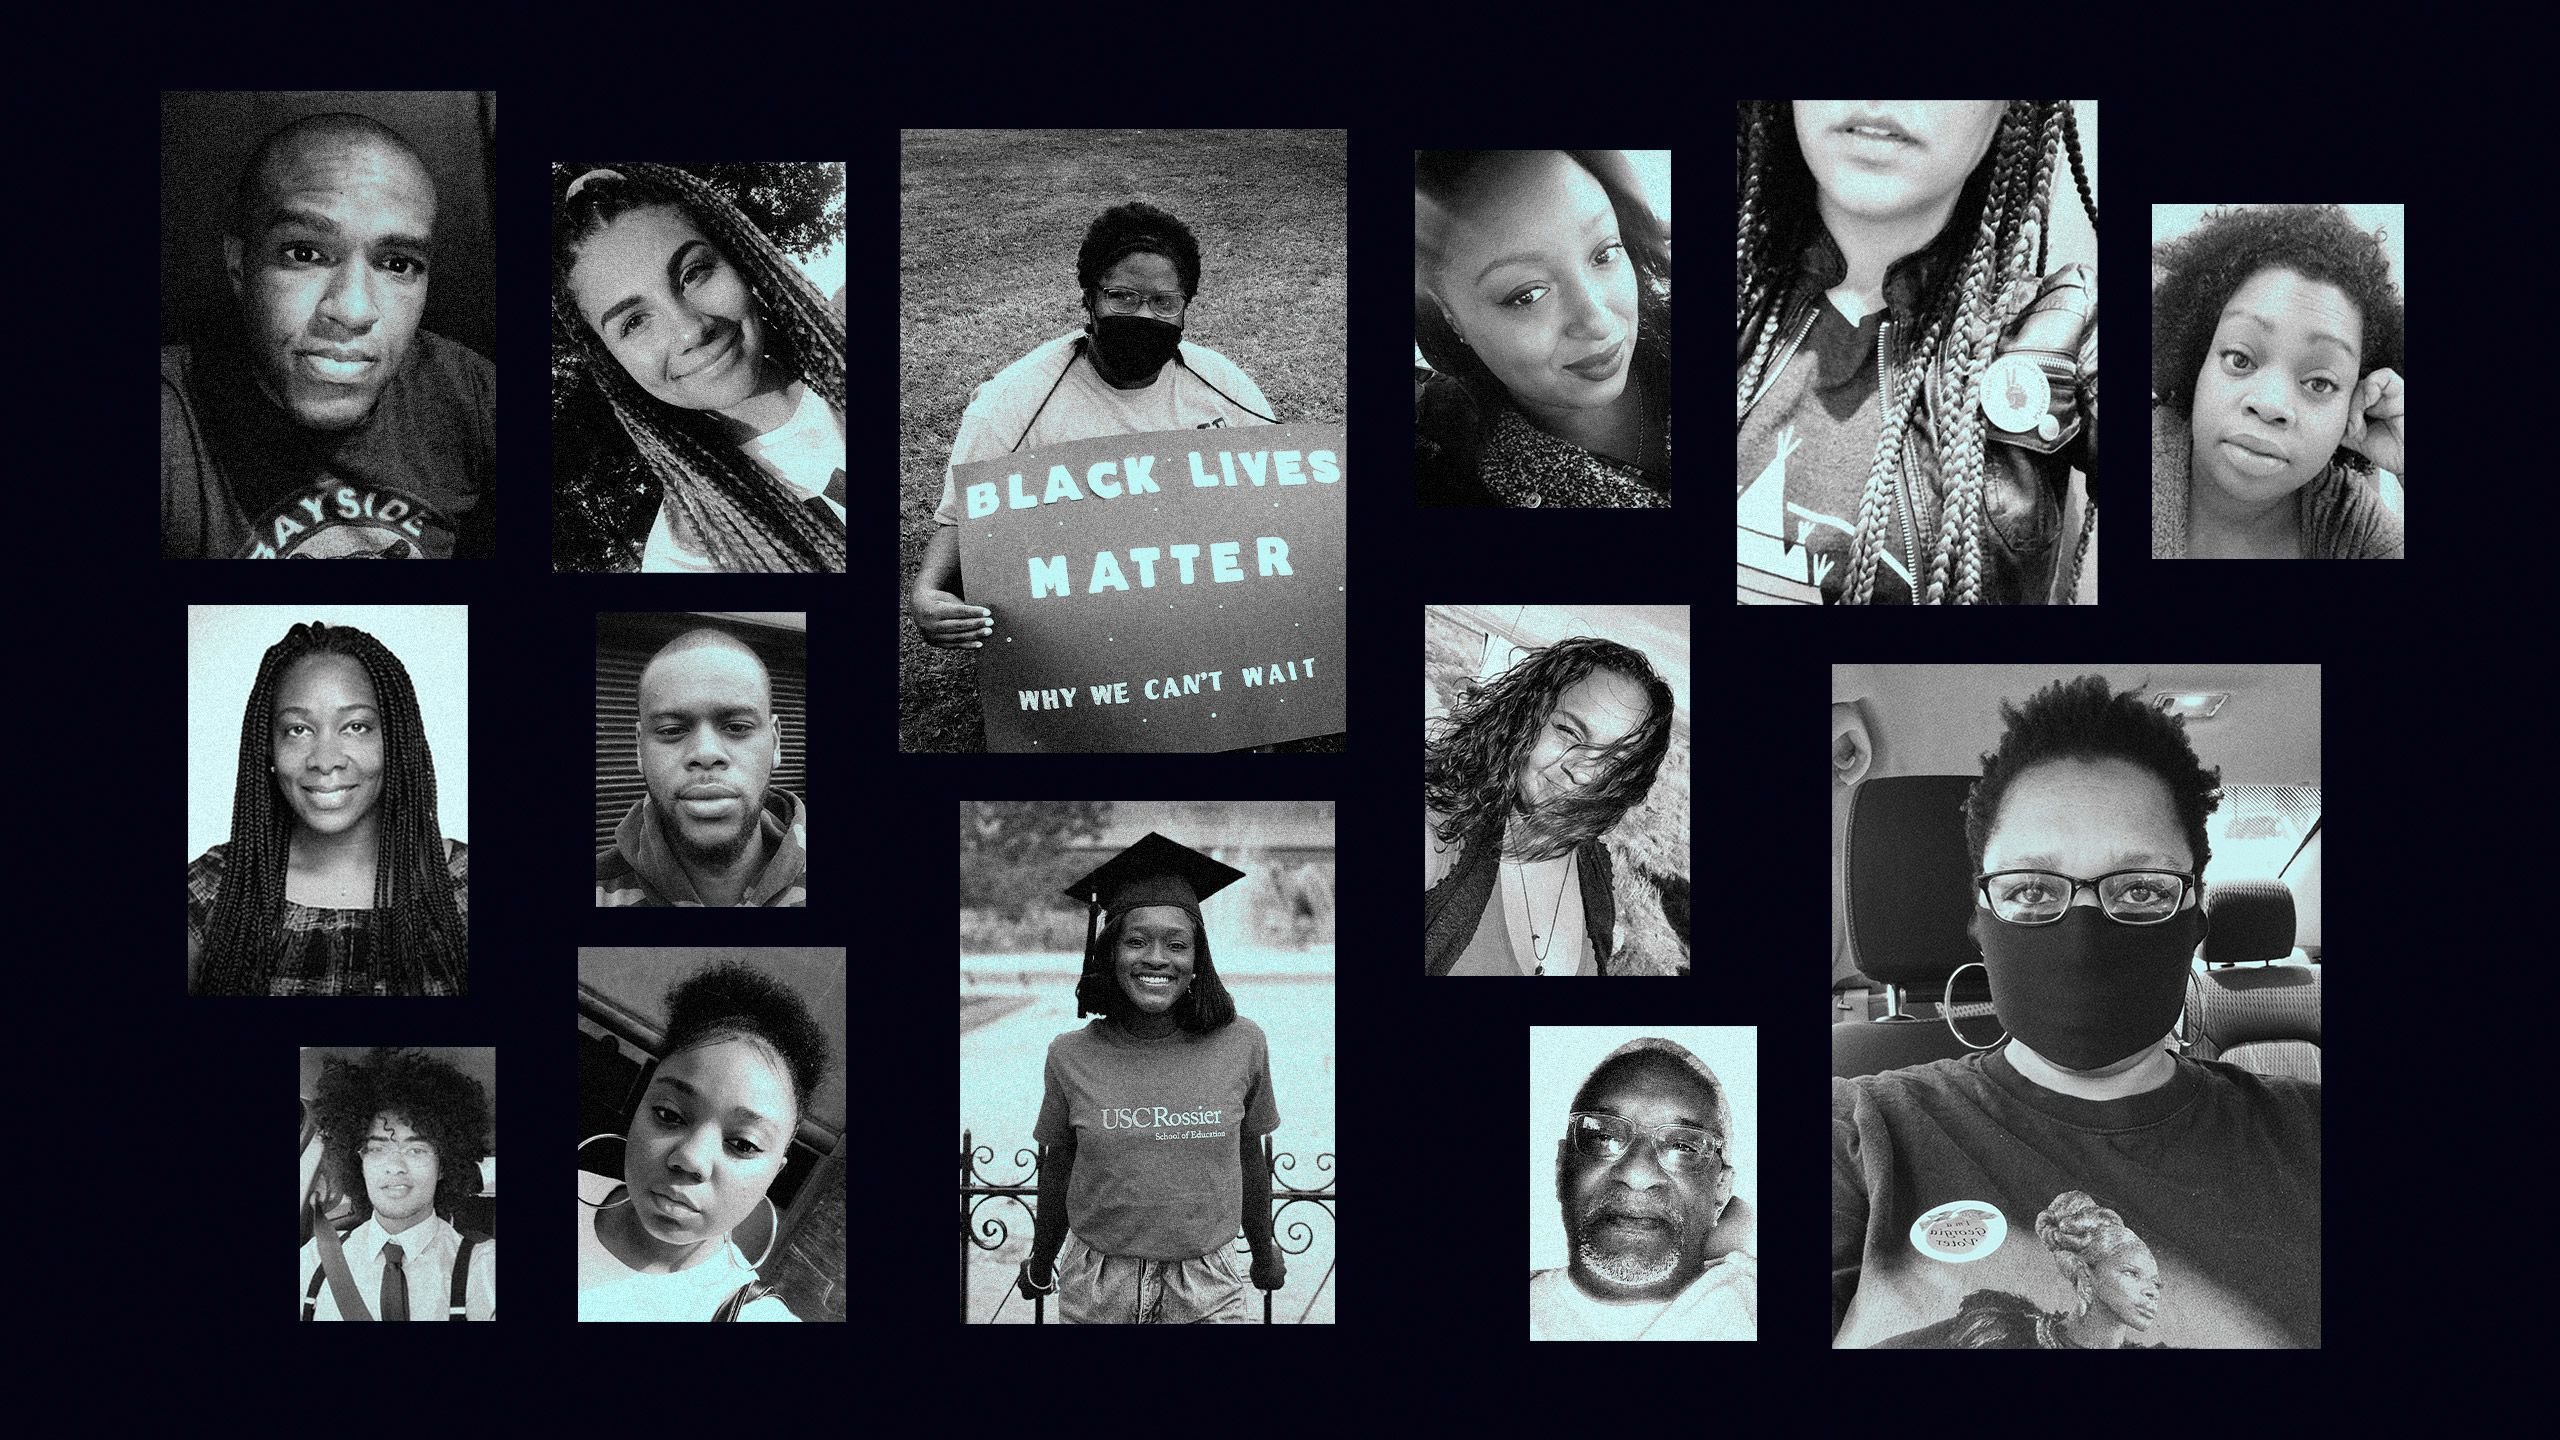 black lives matter pics